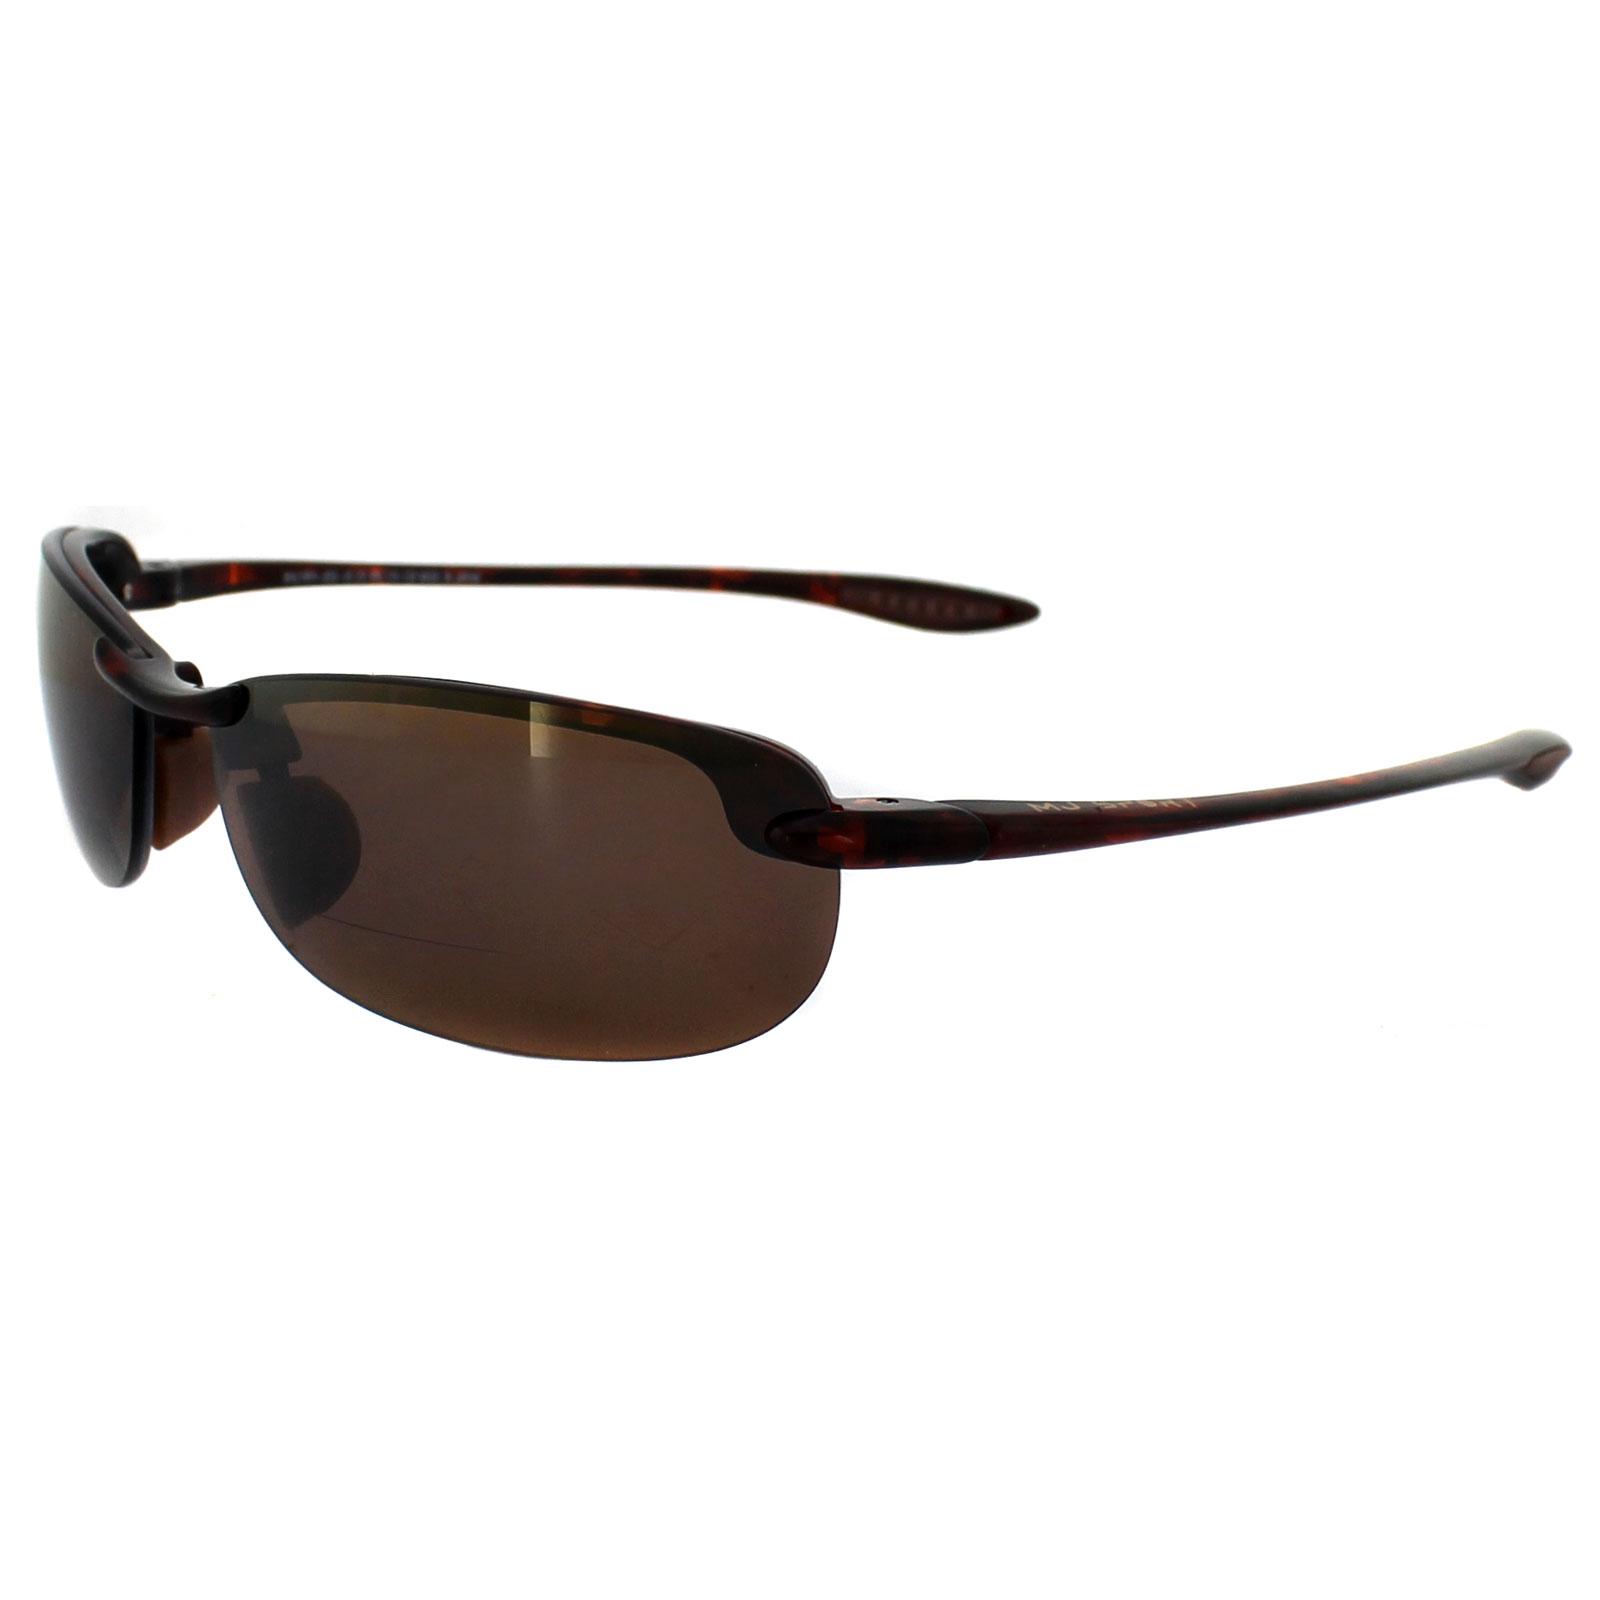 20467253f37c Maui Jim Reader Sunglasses For Women